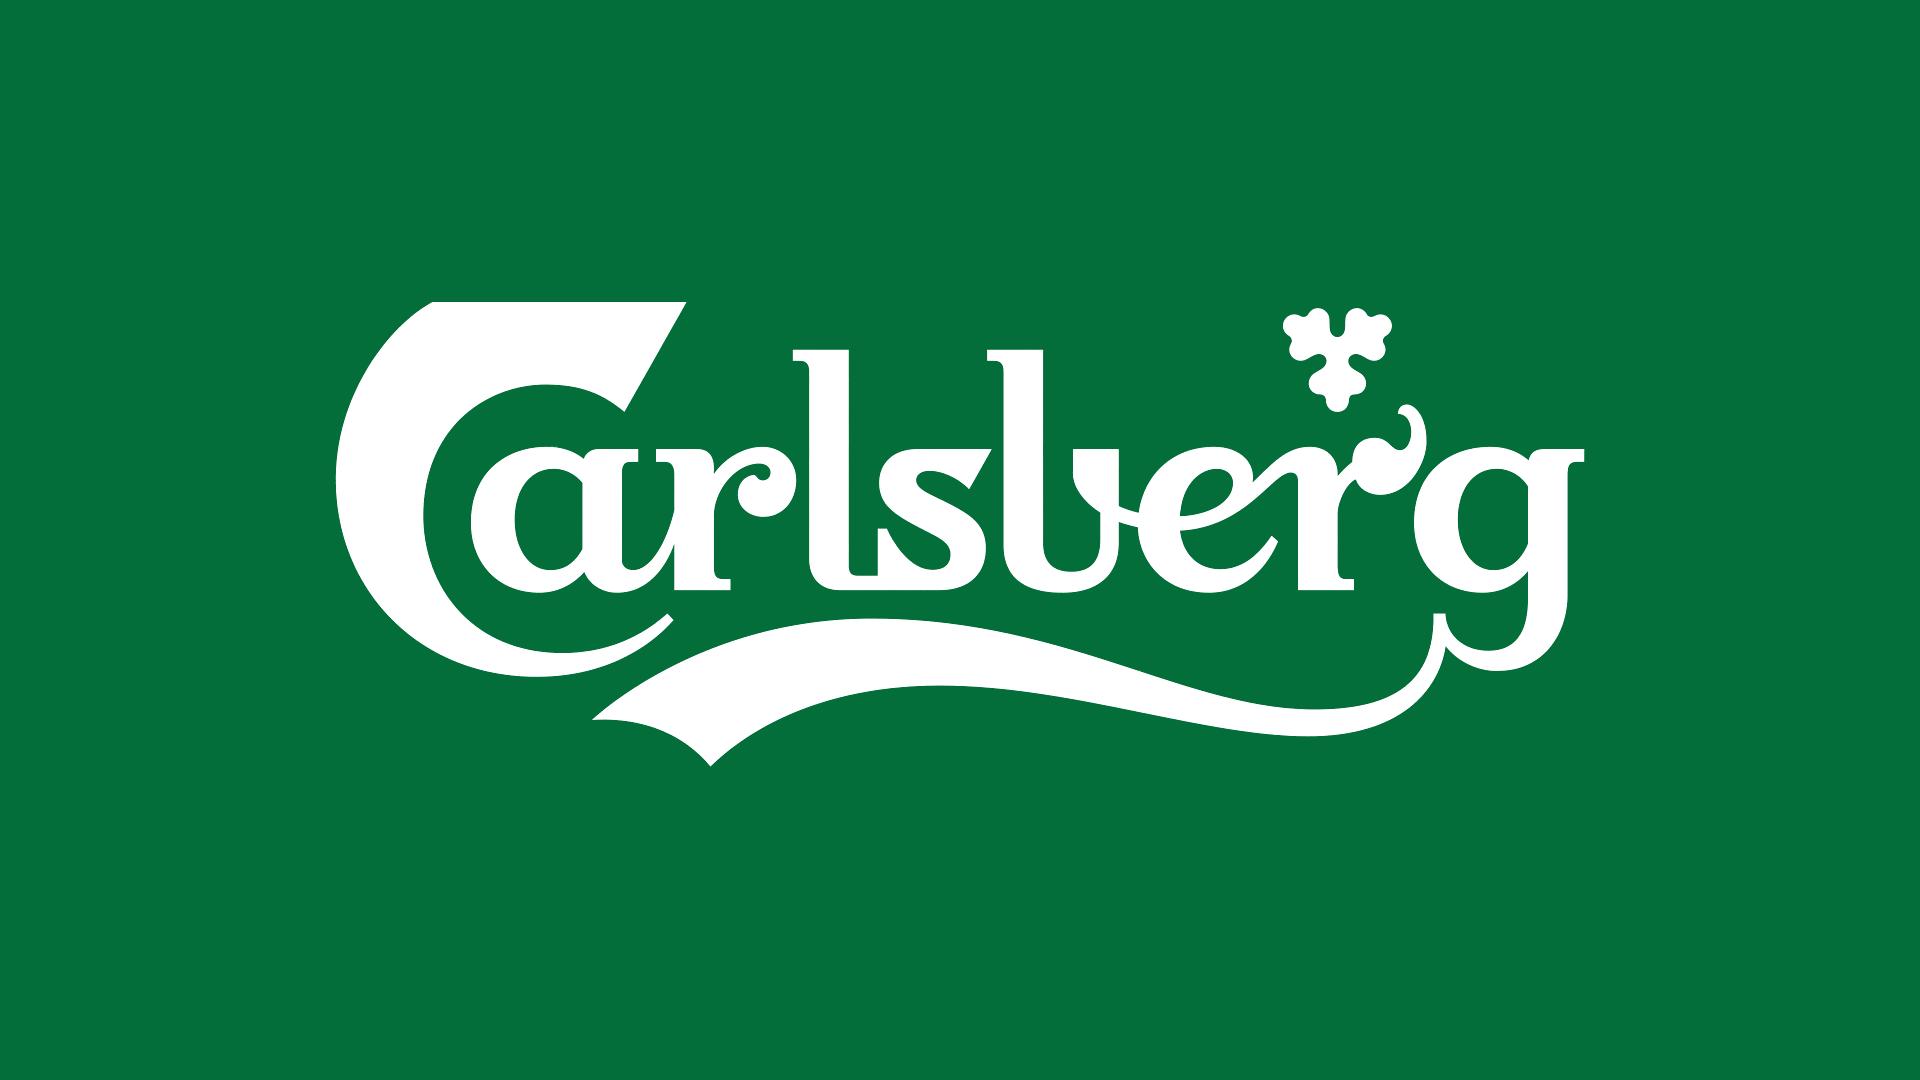 carlsberg_logo